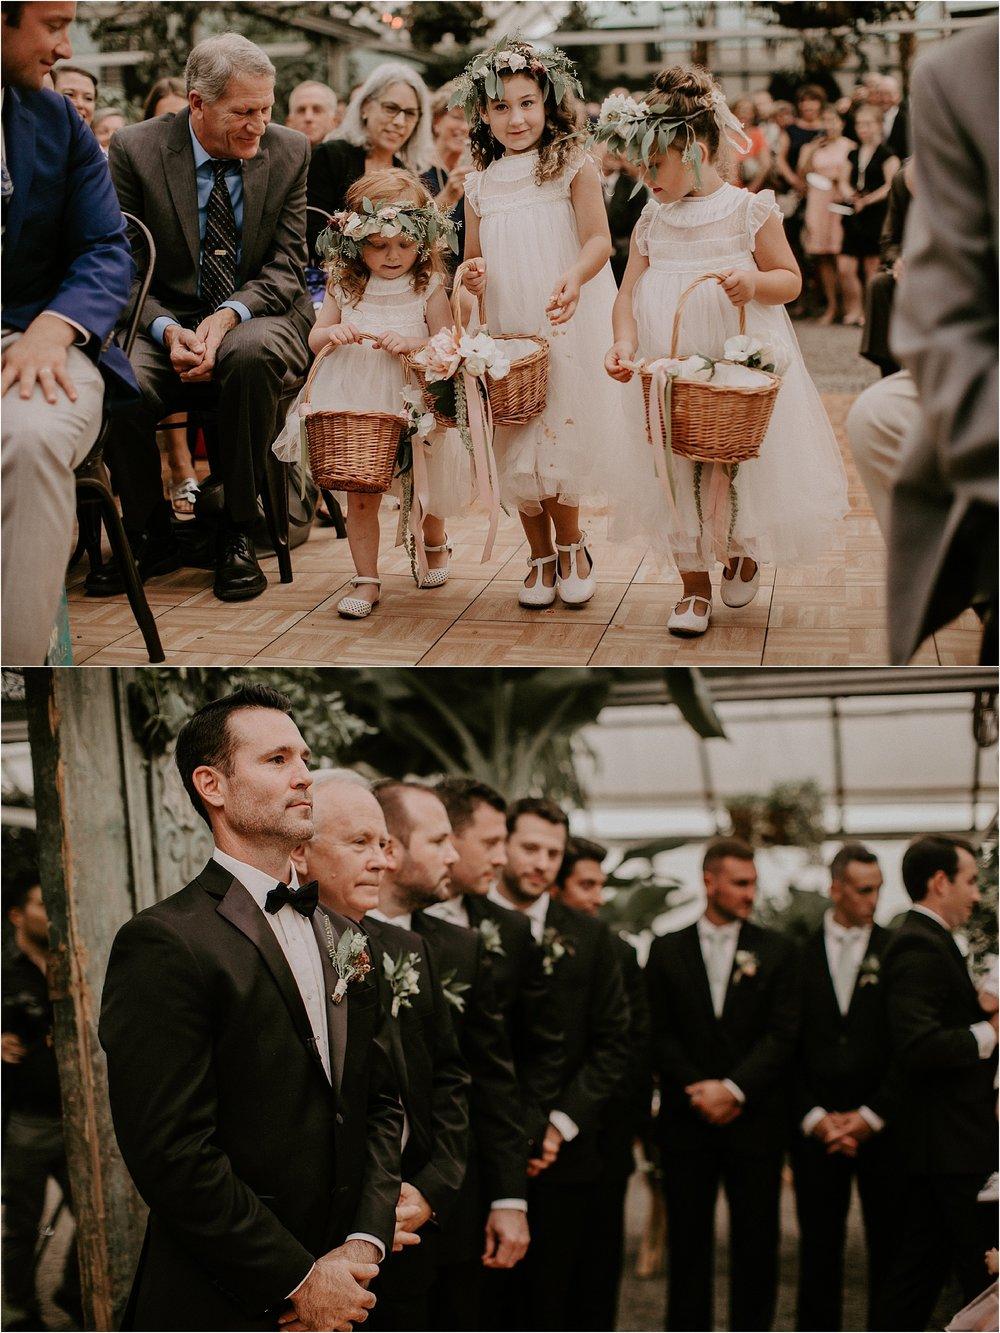 Sarah_Brookhart_Hortulus_Farm_Garden_and_Nursey_Wedding_Photographer_0044.jpg